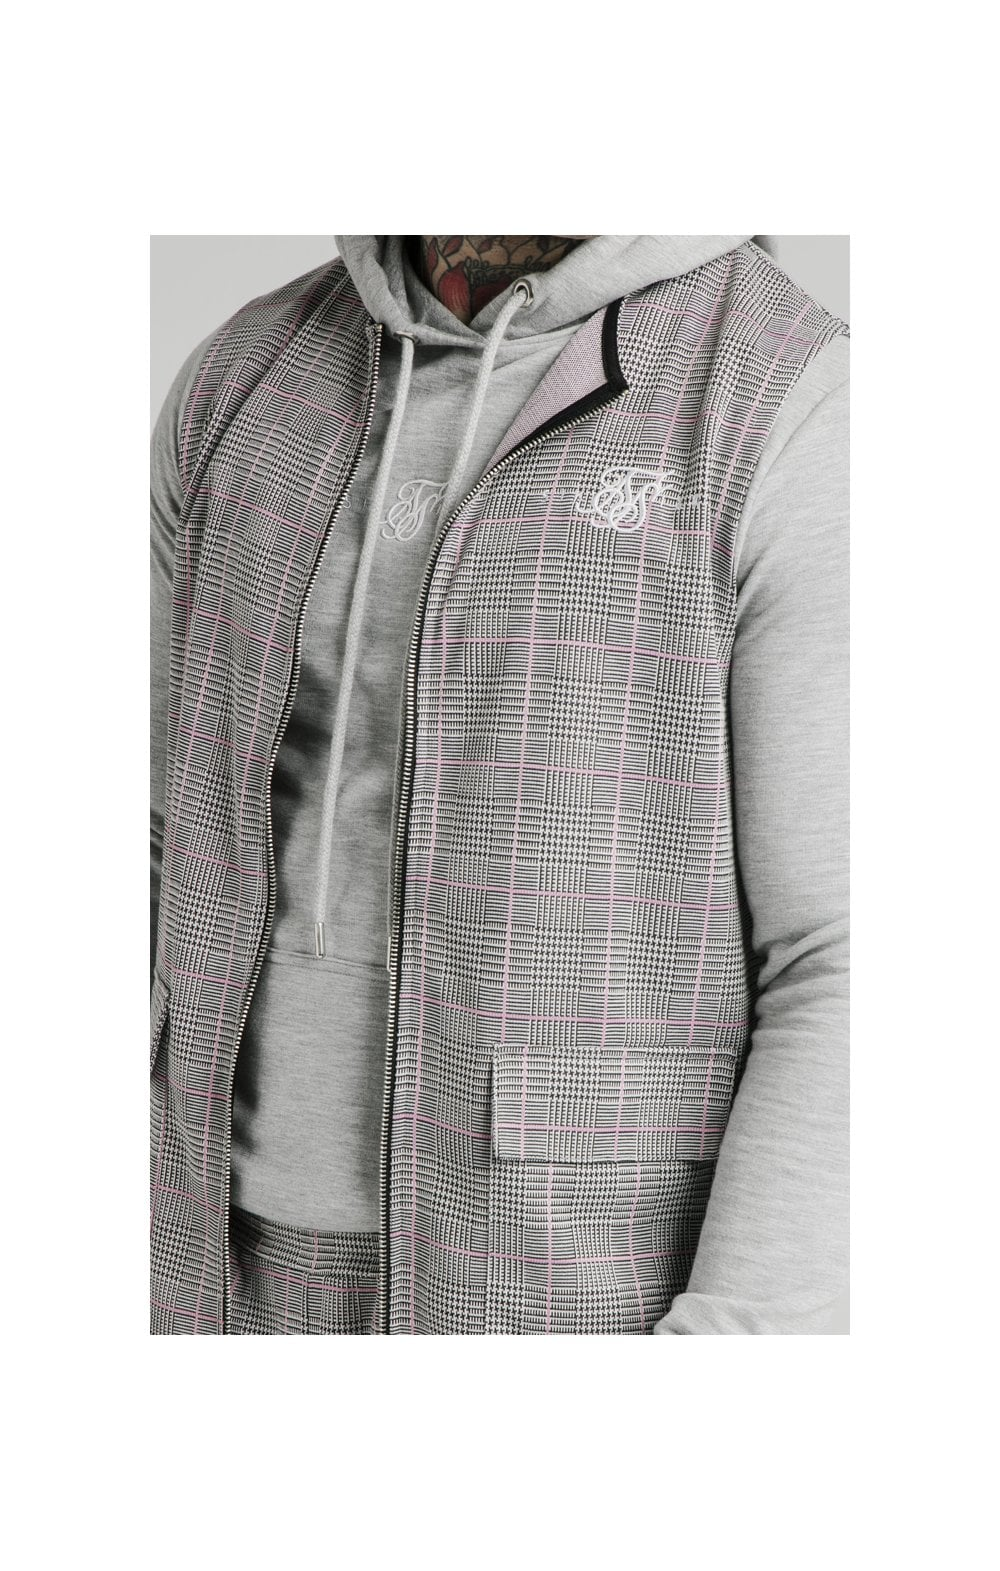 SikSilk Smart Wear Vest - Grey & Pink MEN SIZES TOP: Extra Large